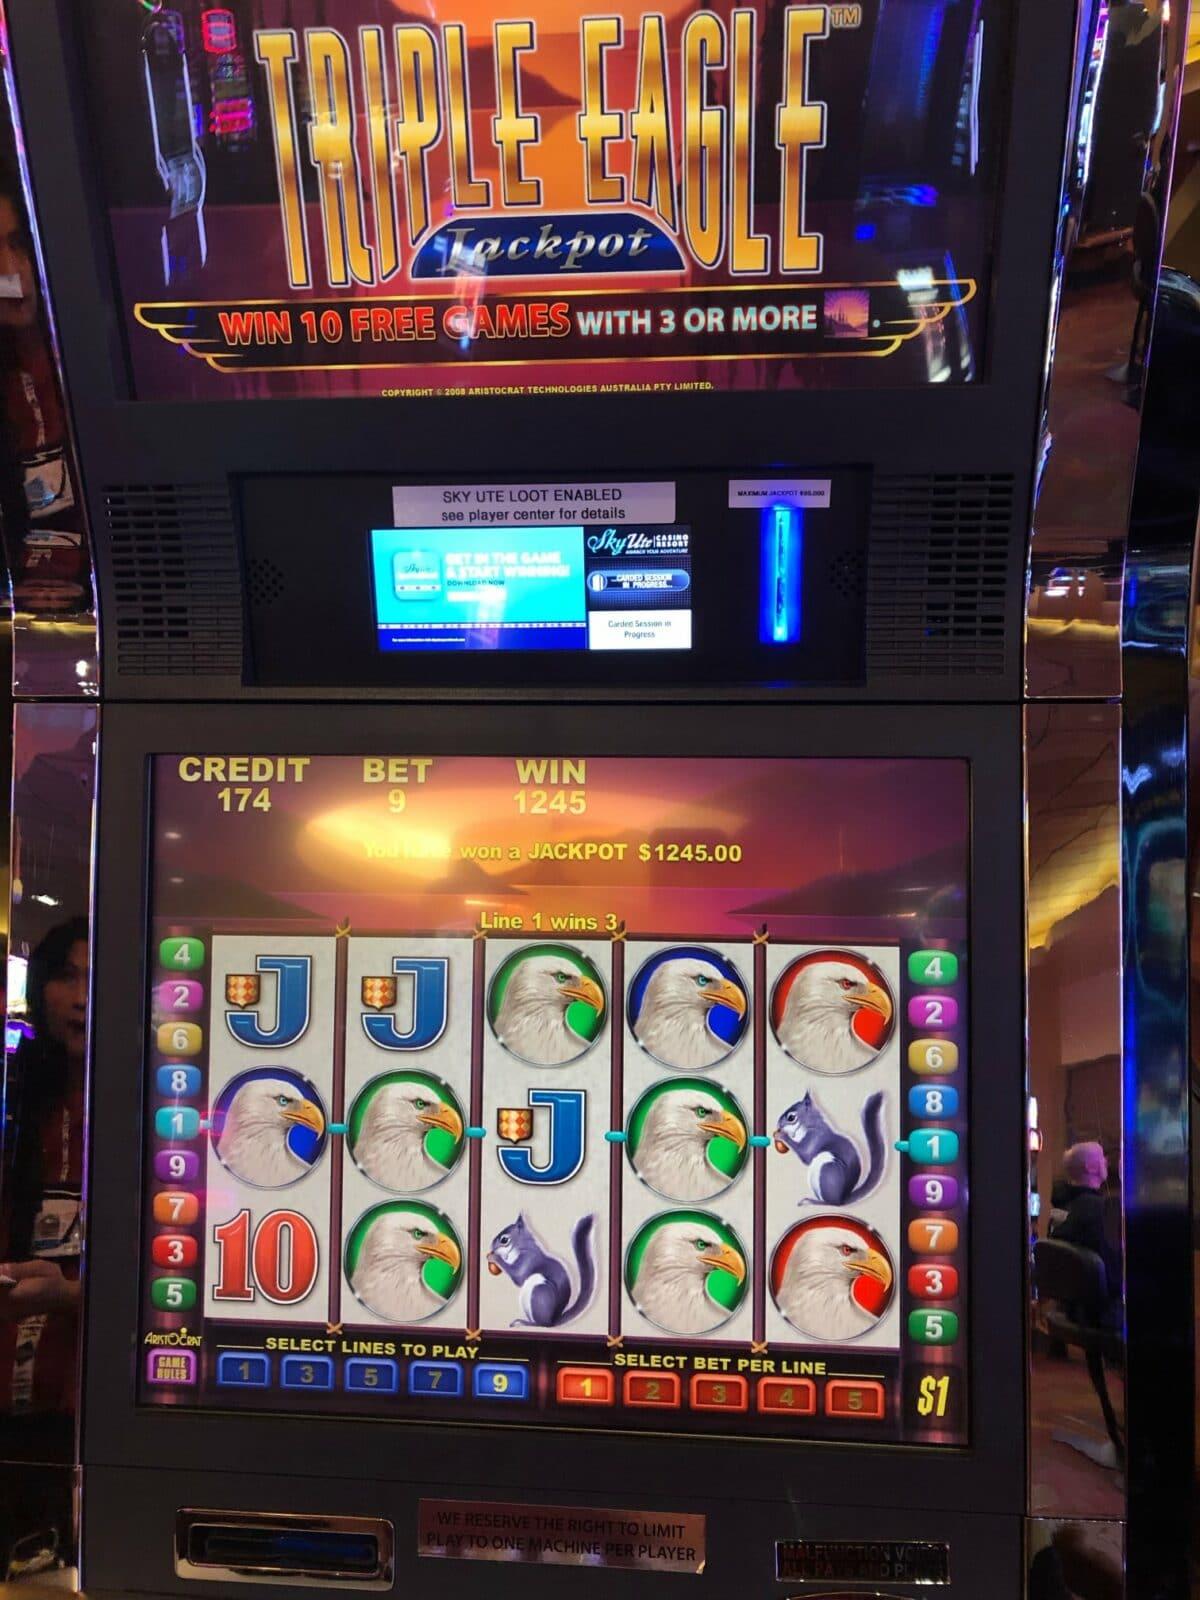 Image of a slot machine at Sky Ute Casino Resort in Ignacio, Colorado